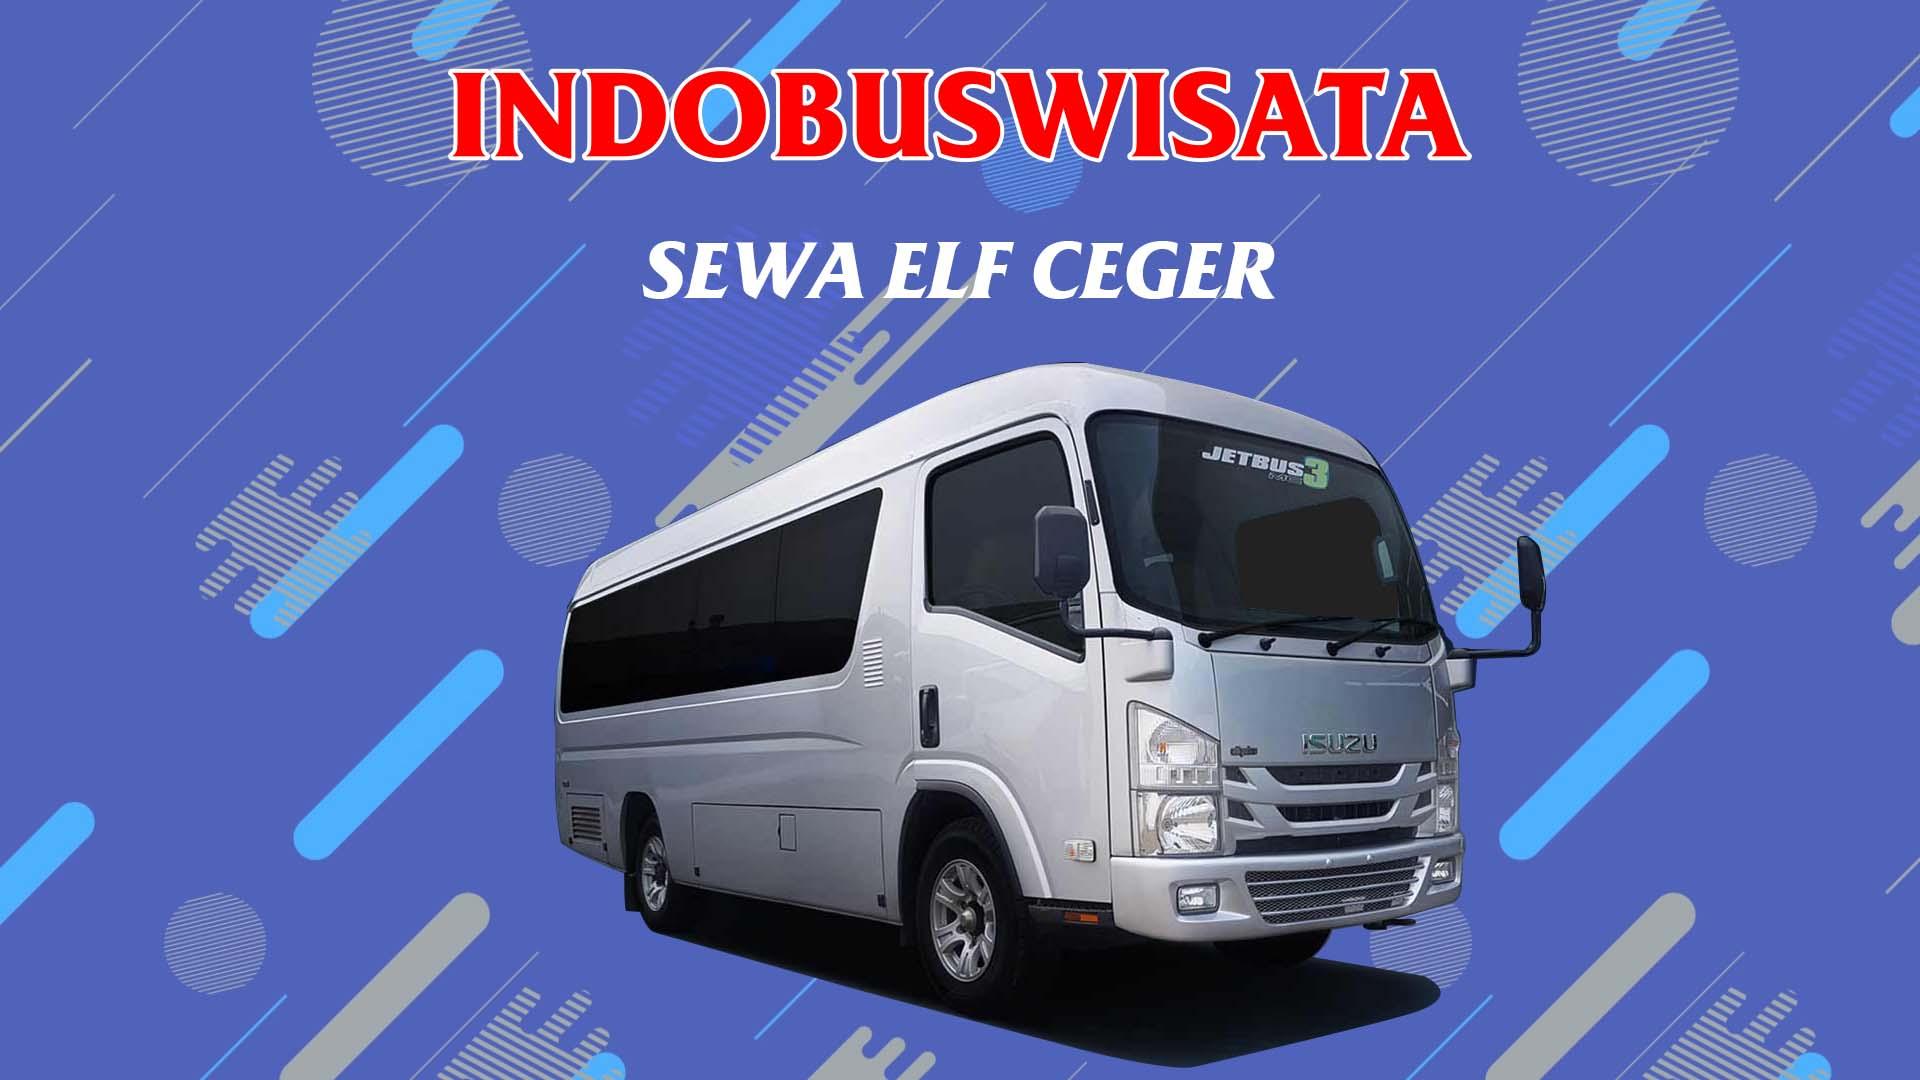 010 Sewa Elf Ceger Indobuswisata